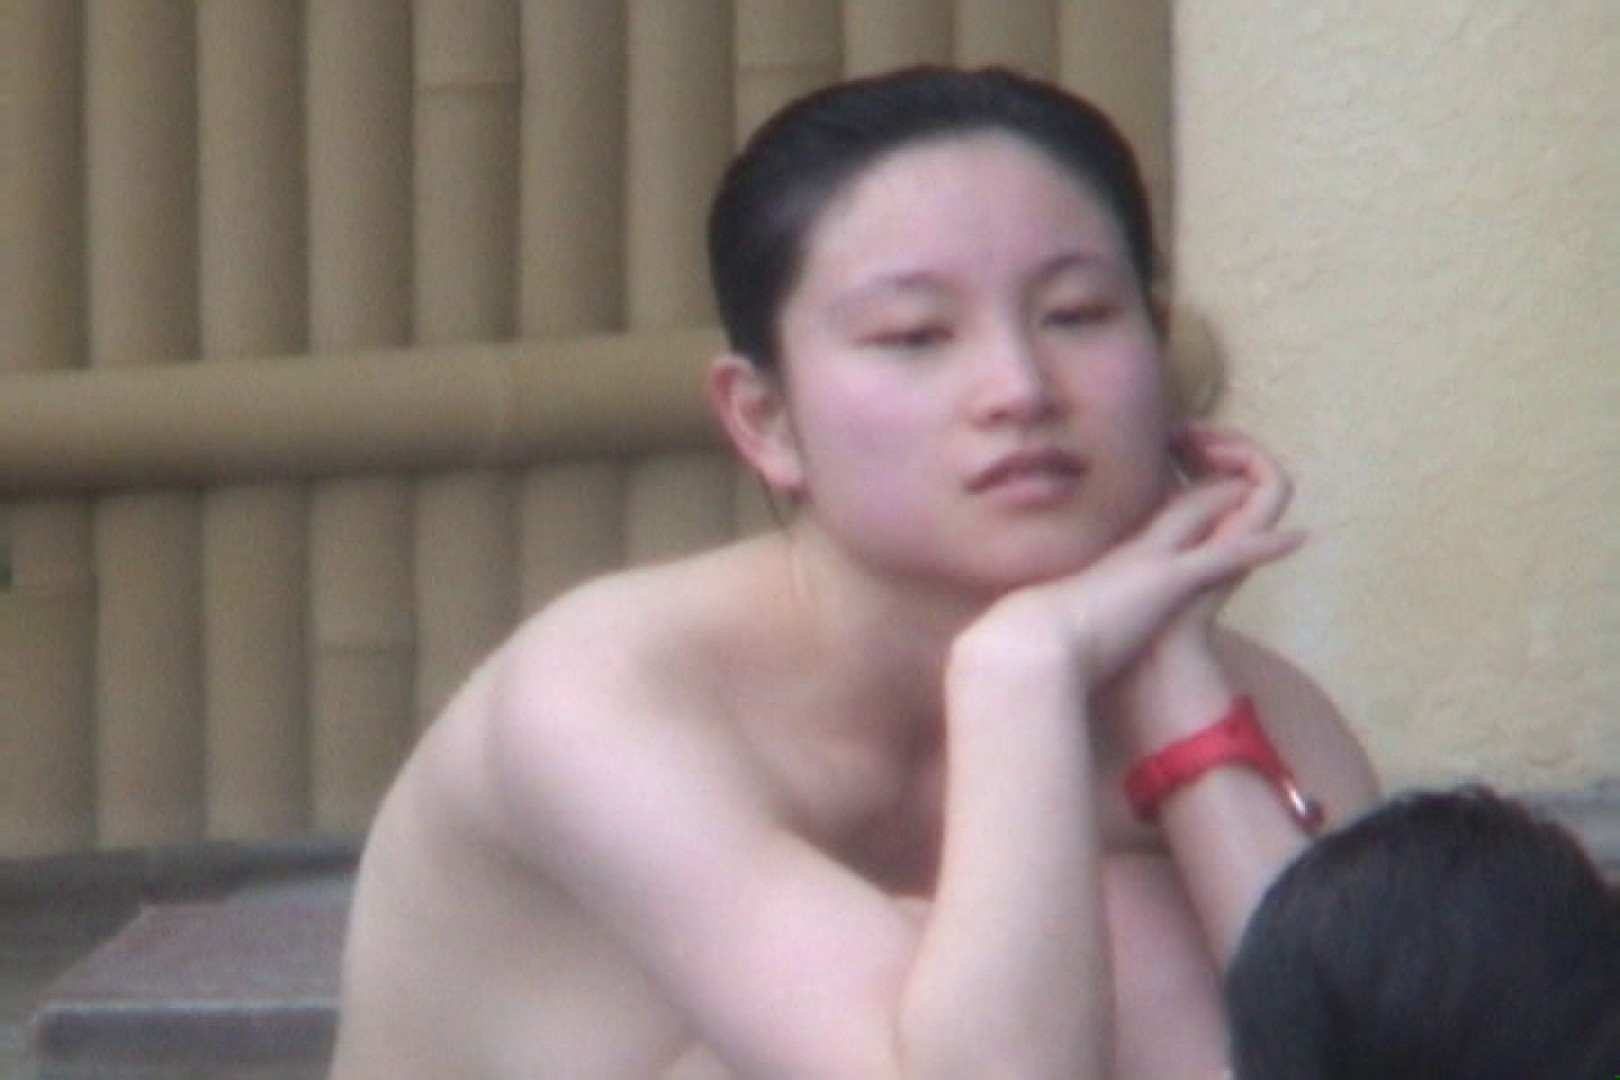 Aquaな露天風呂Vol.45【VIP限定】 HなOL   盗撮  100pic 32